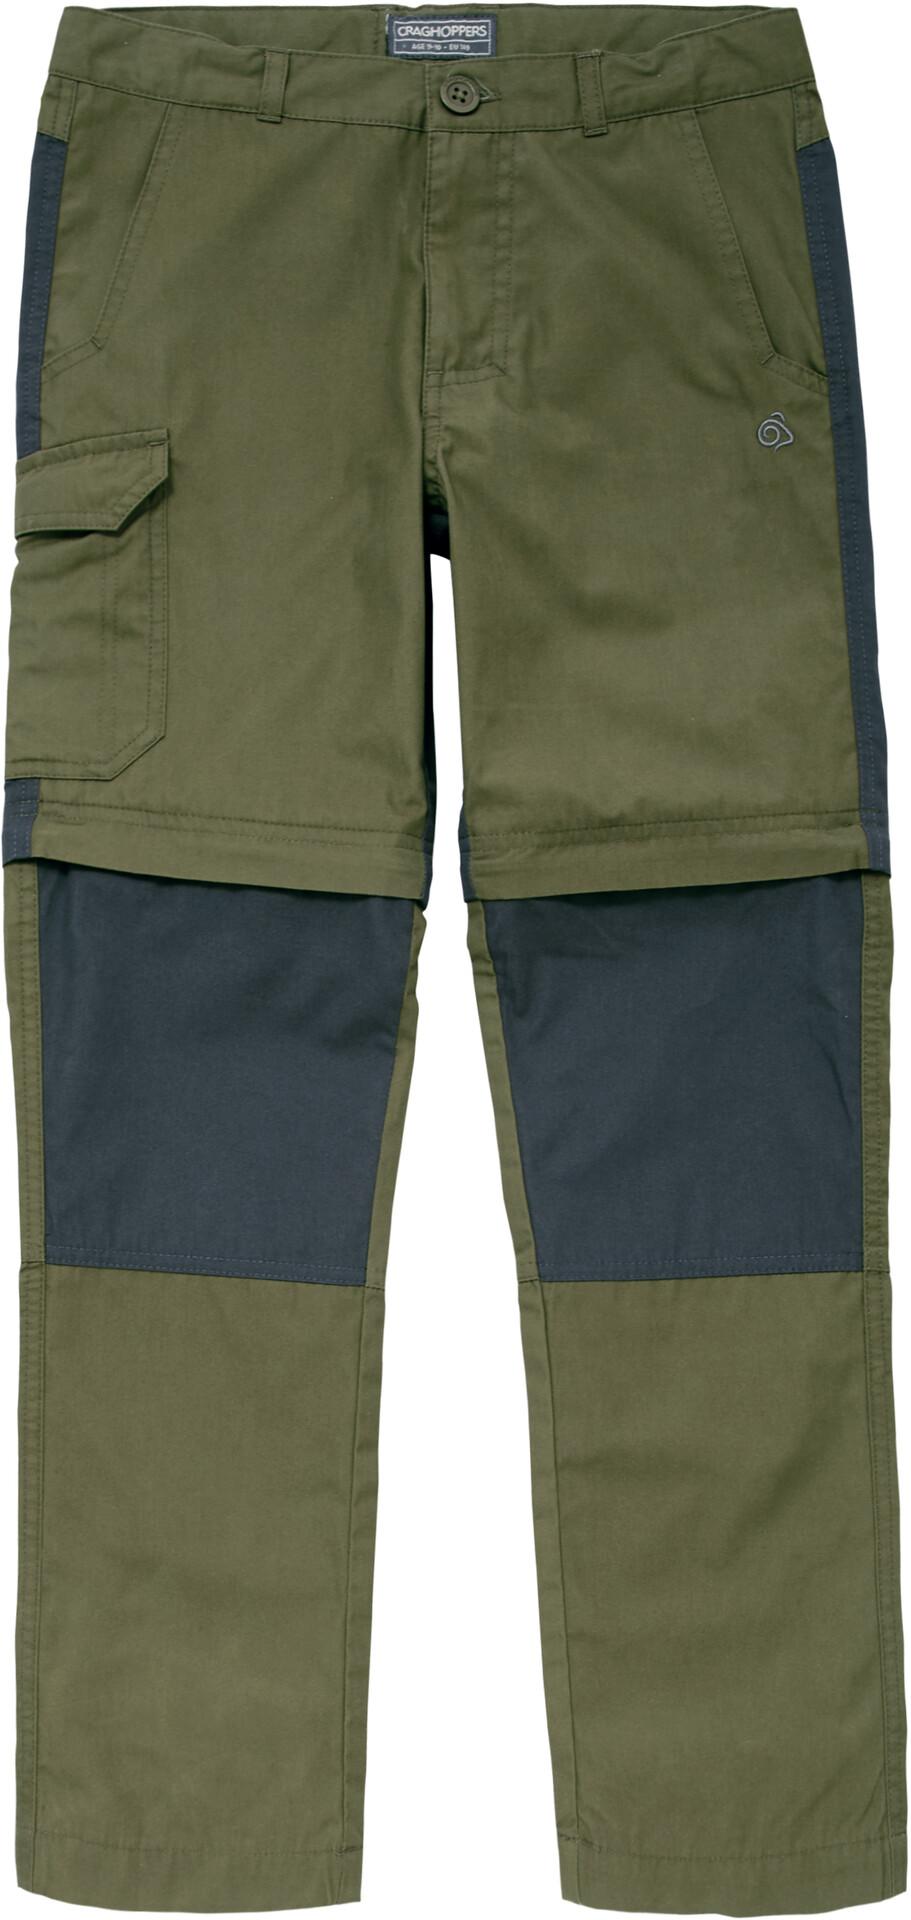 Pantalon Convertible pour Enfant Craghoppers Kiwi